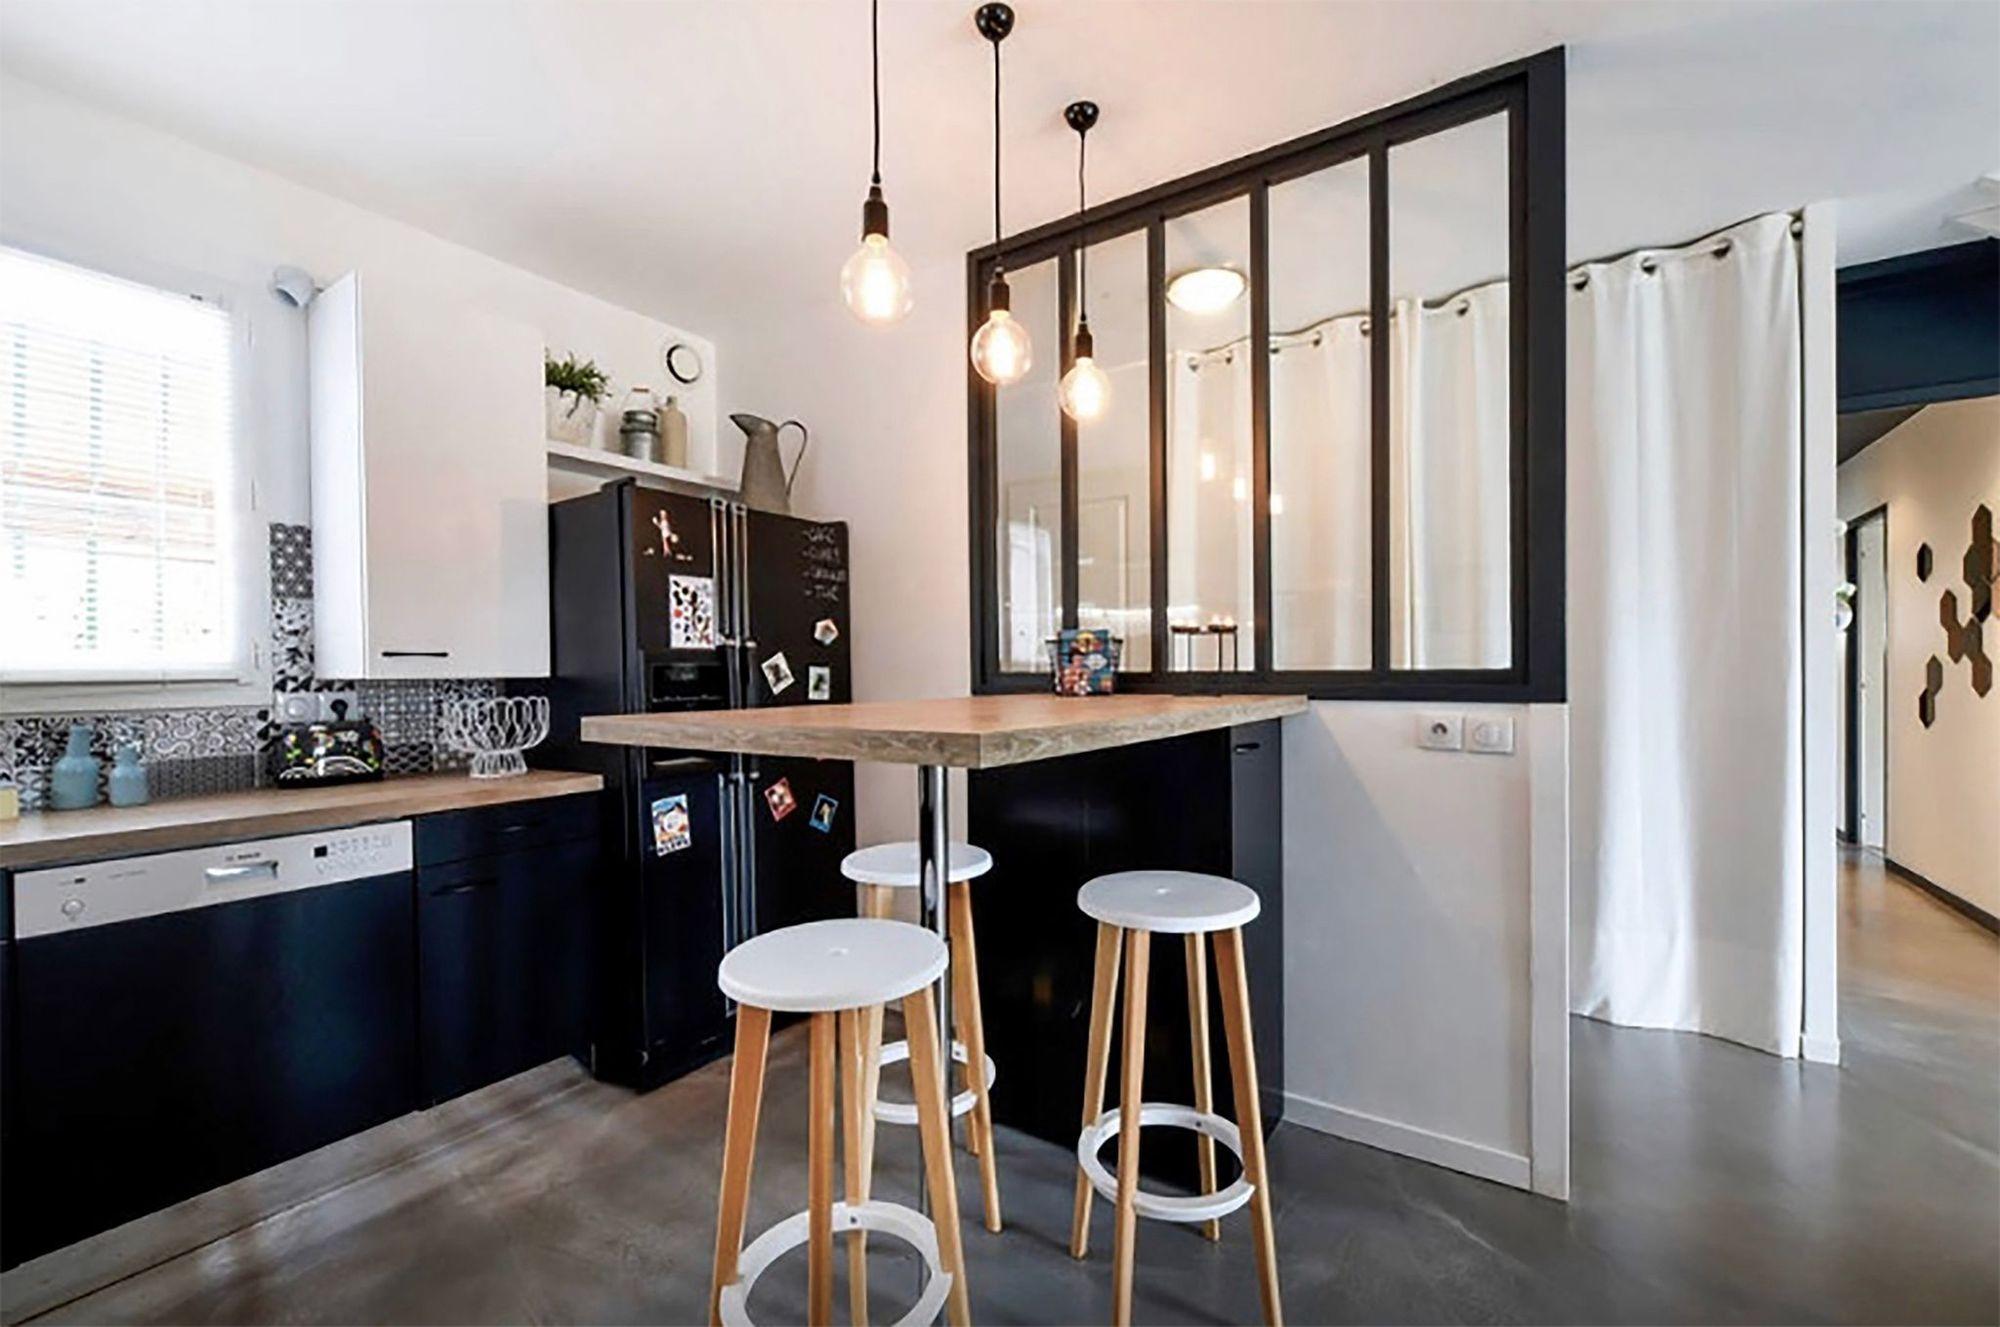 Meuble bar pour cuisine ouverte : nos conseils  Bar cuisine